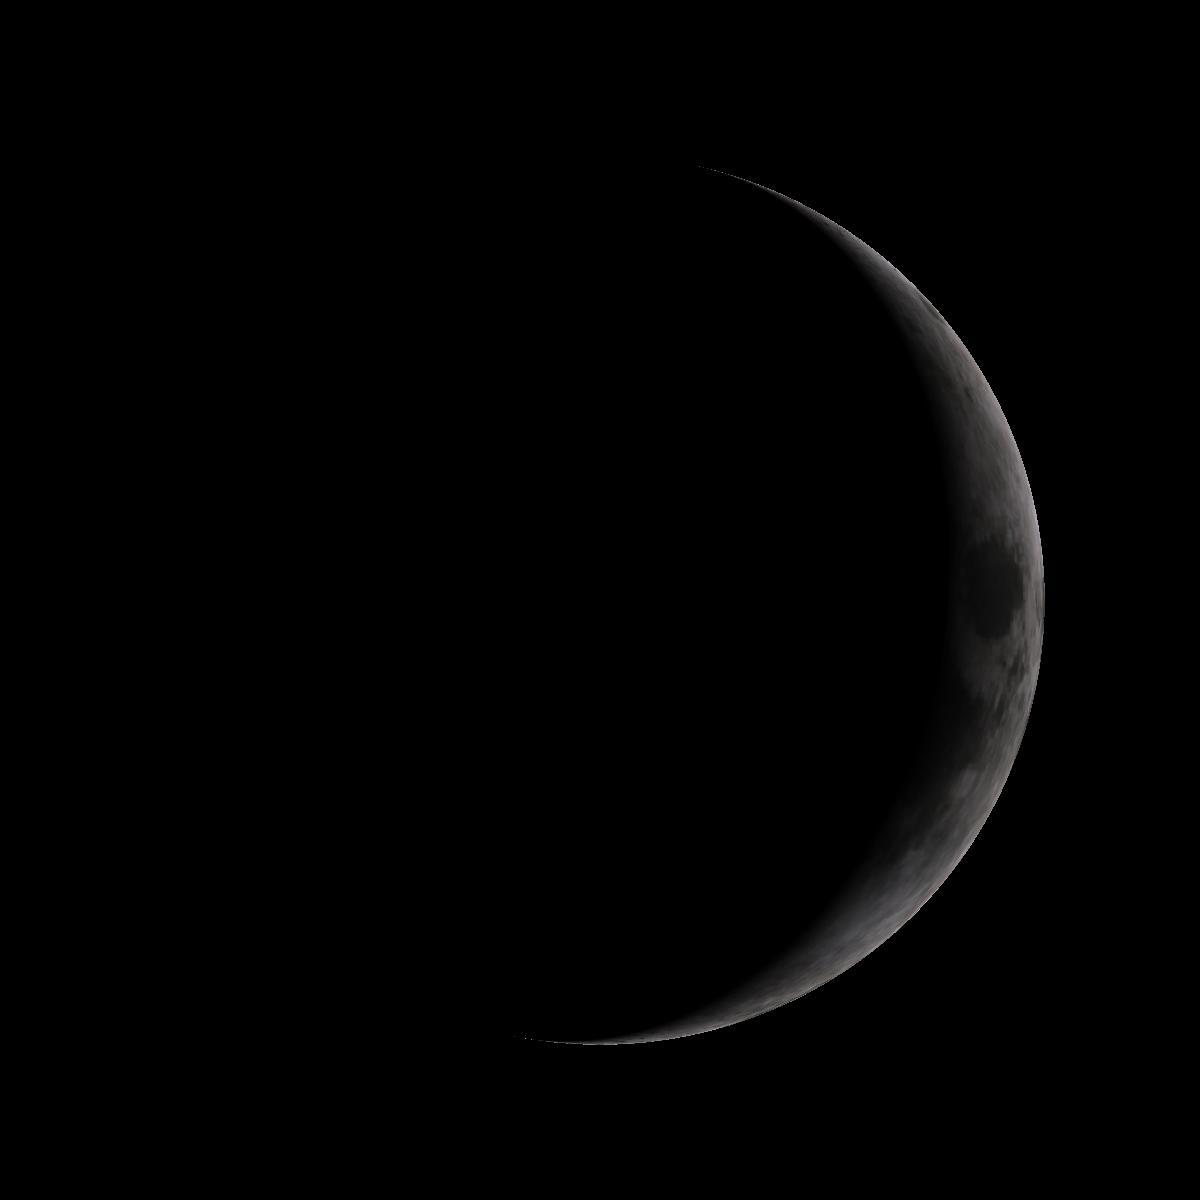 Lune du 28 mars 2020